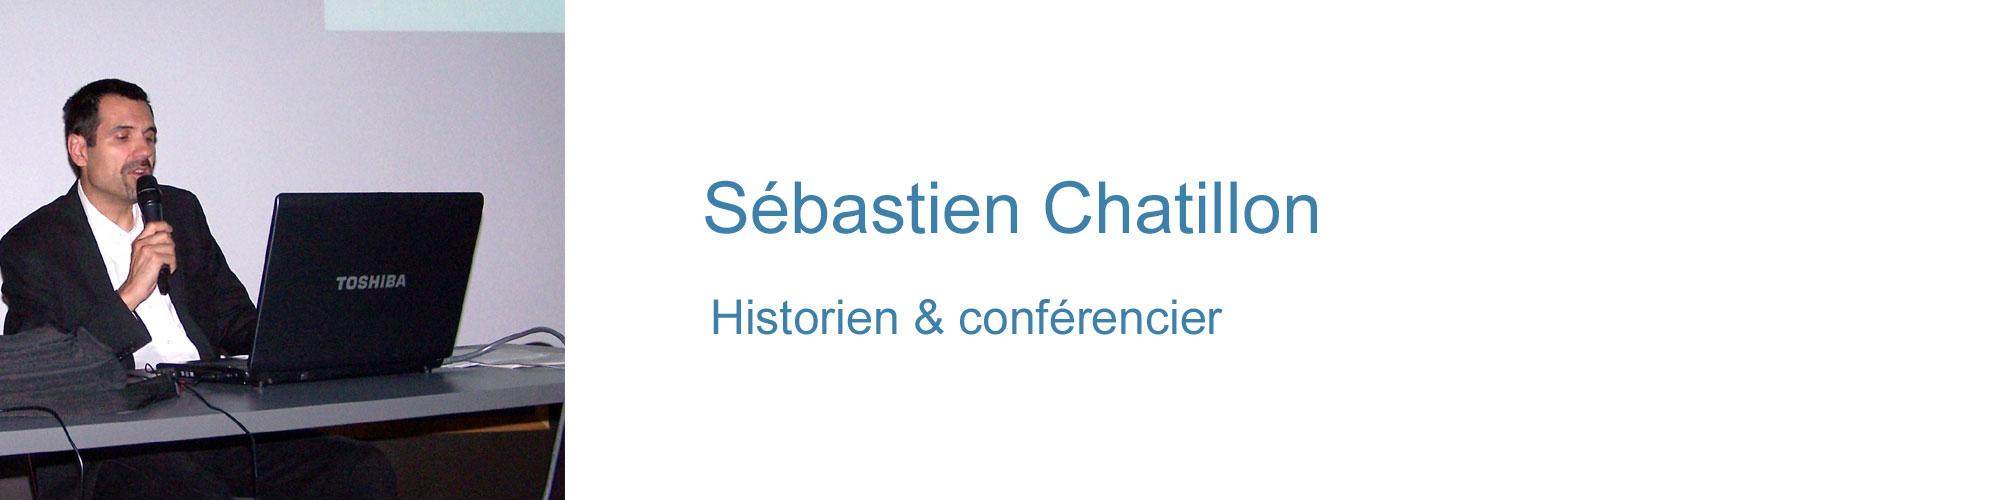 Sébastien Chatillon, historien & conférencier